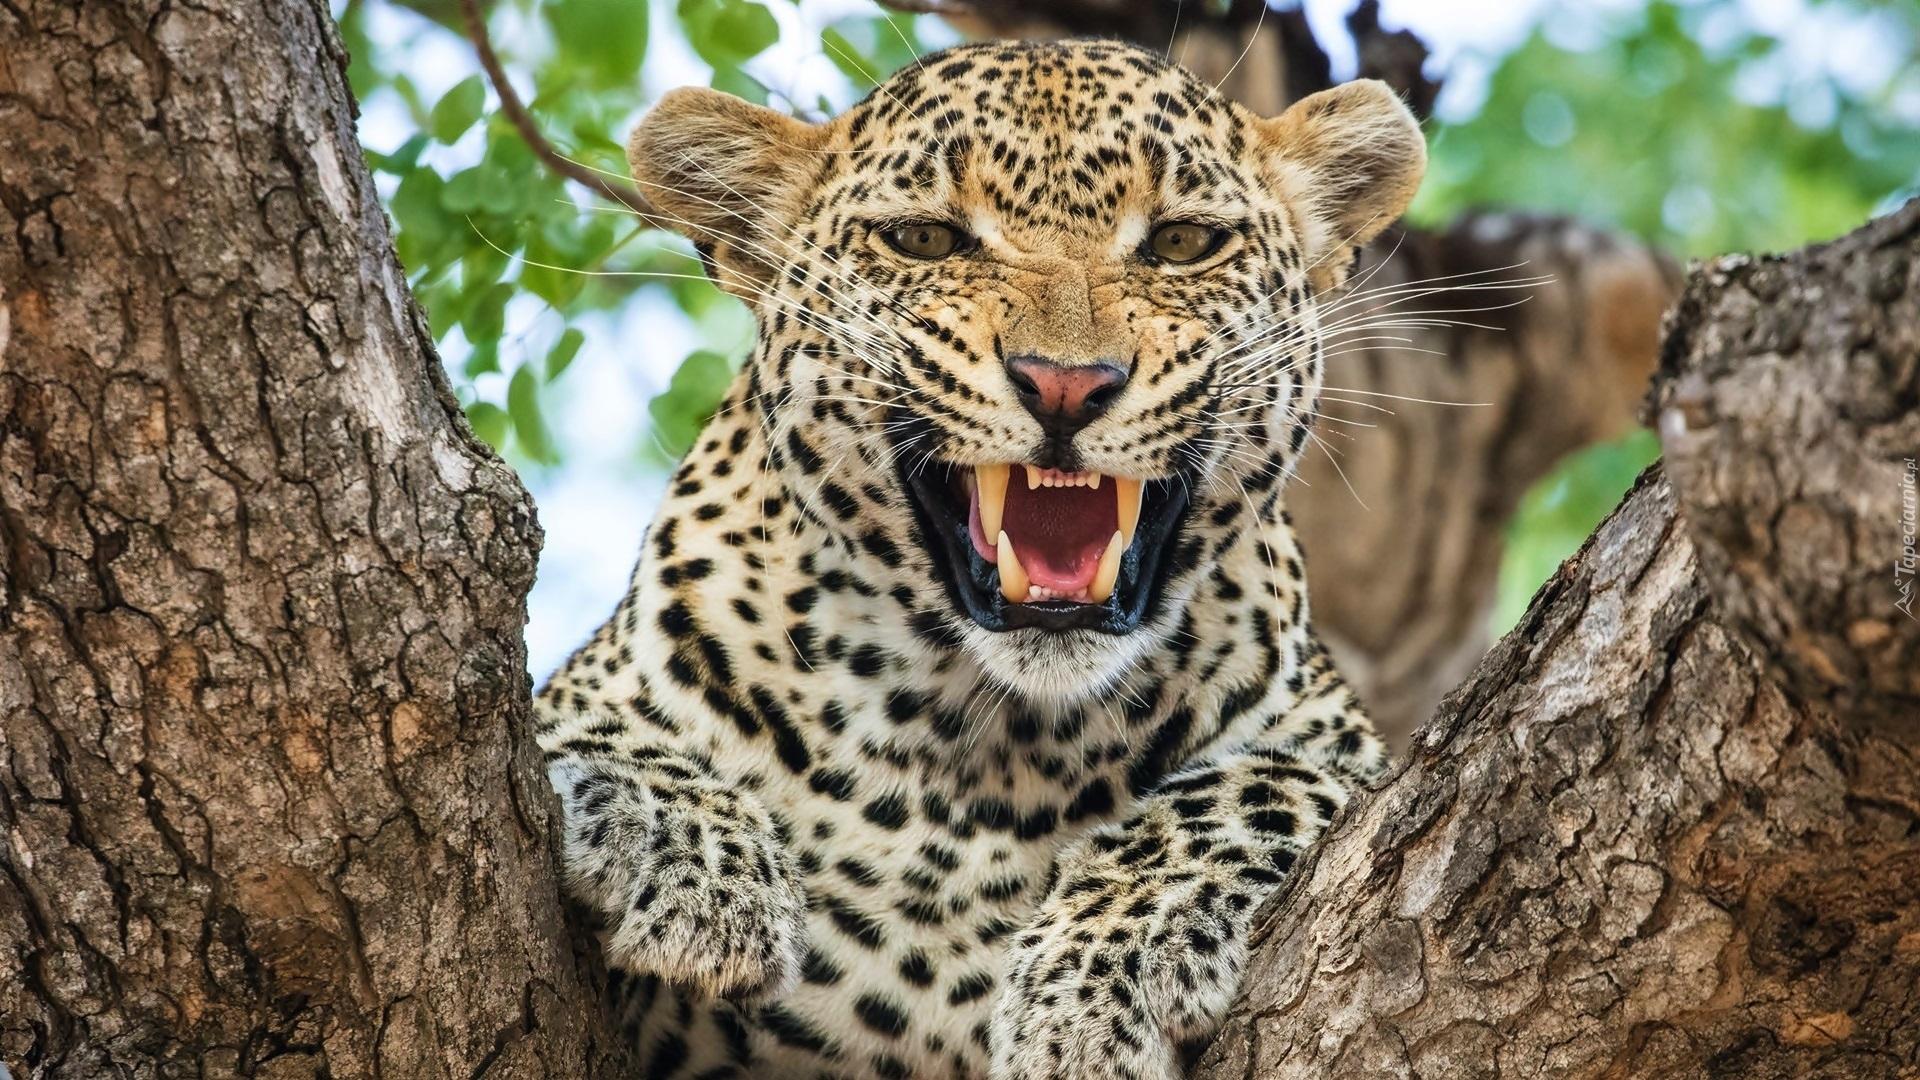 jaguar afrika with Tapeta Grozny L Art Plamisty Szczerzy Kly Na Drzewie on Leoparden Alles Ueber Die Stolzen Raeuber together with Fennek as well Animal Of Week Amur Leopard in addition 574 Kamel Dromedar Unterschied as well King Cheetah 357525586.